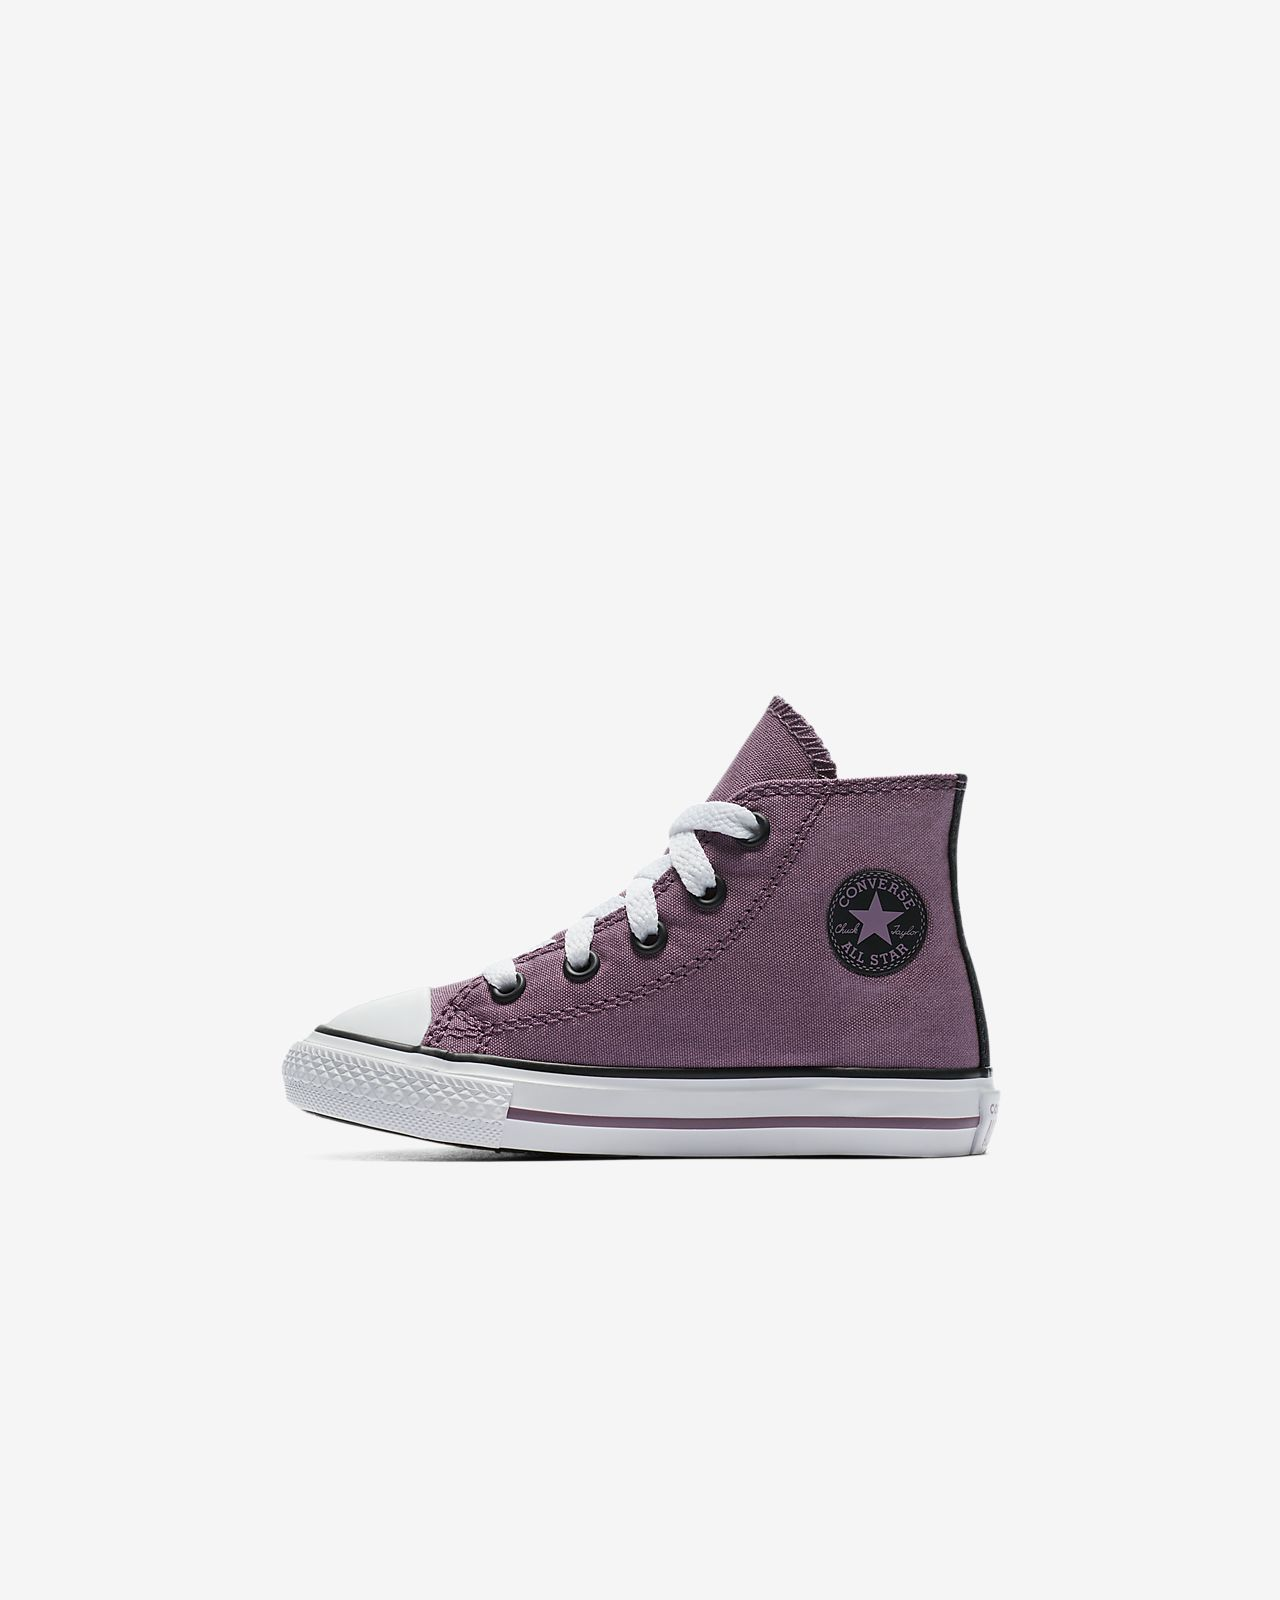 Converse Chuck Taylor All Star Seasonal Color High Top Infants' Shoe